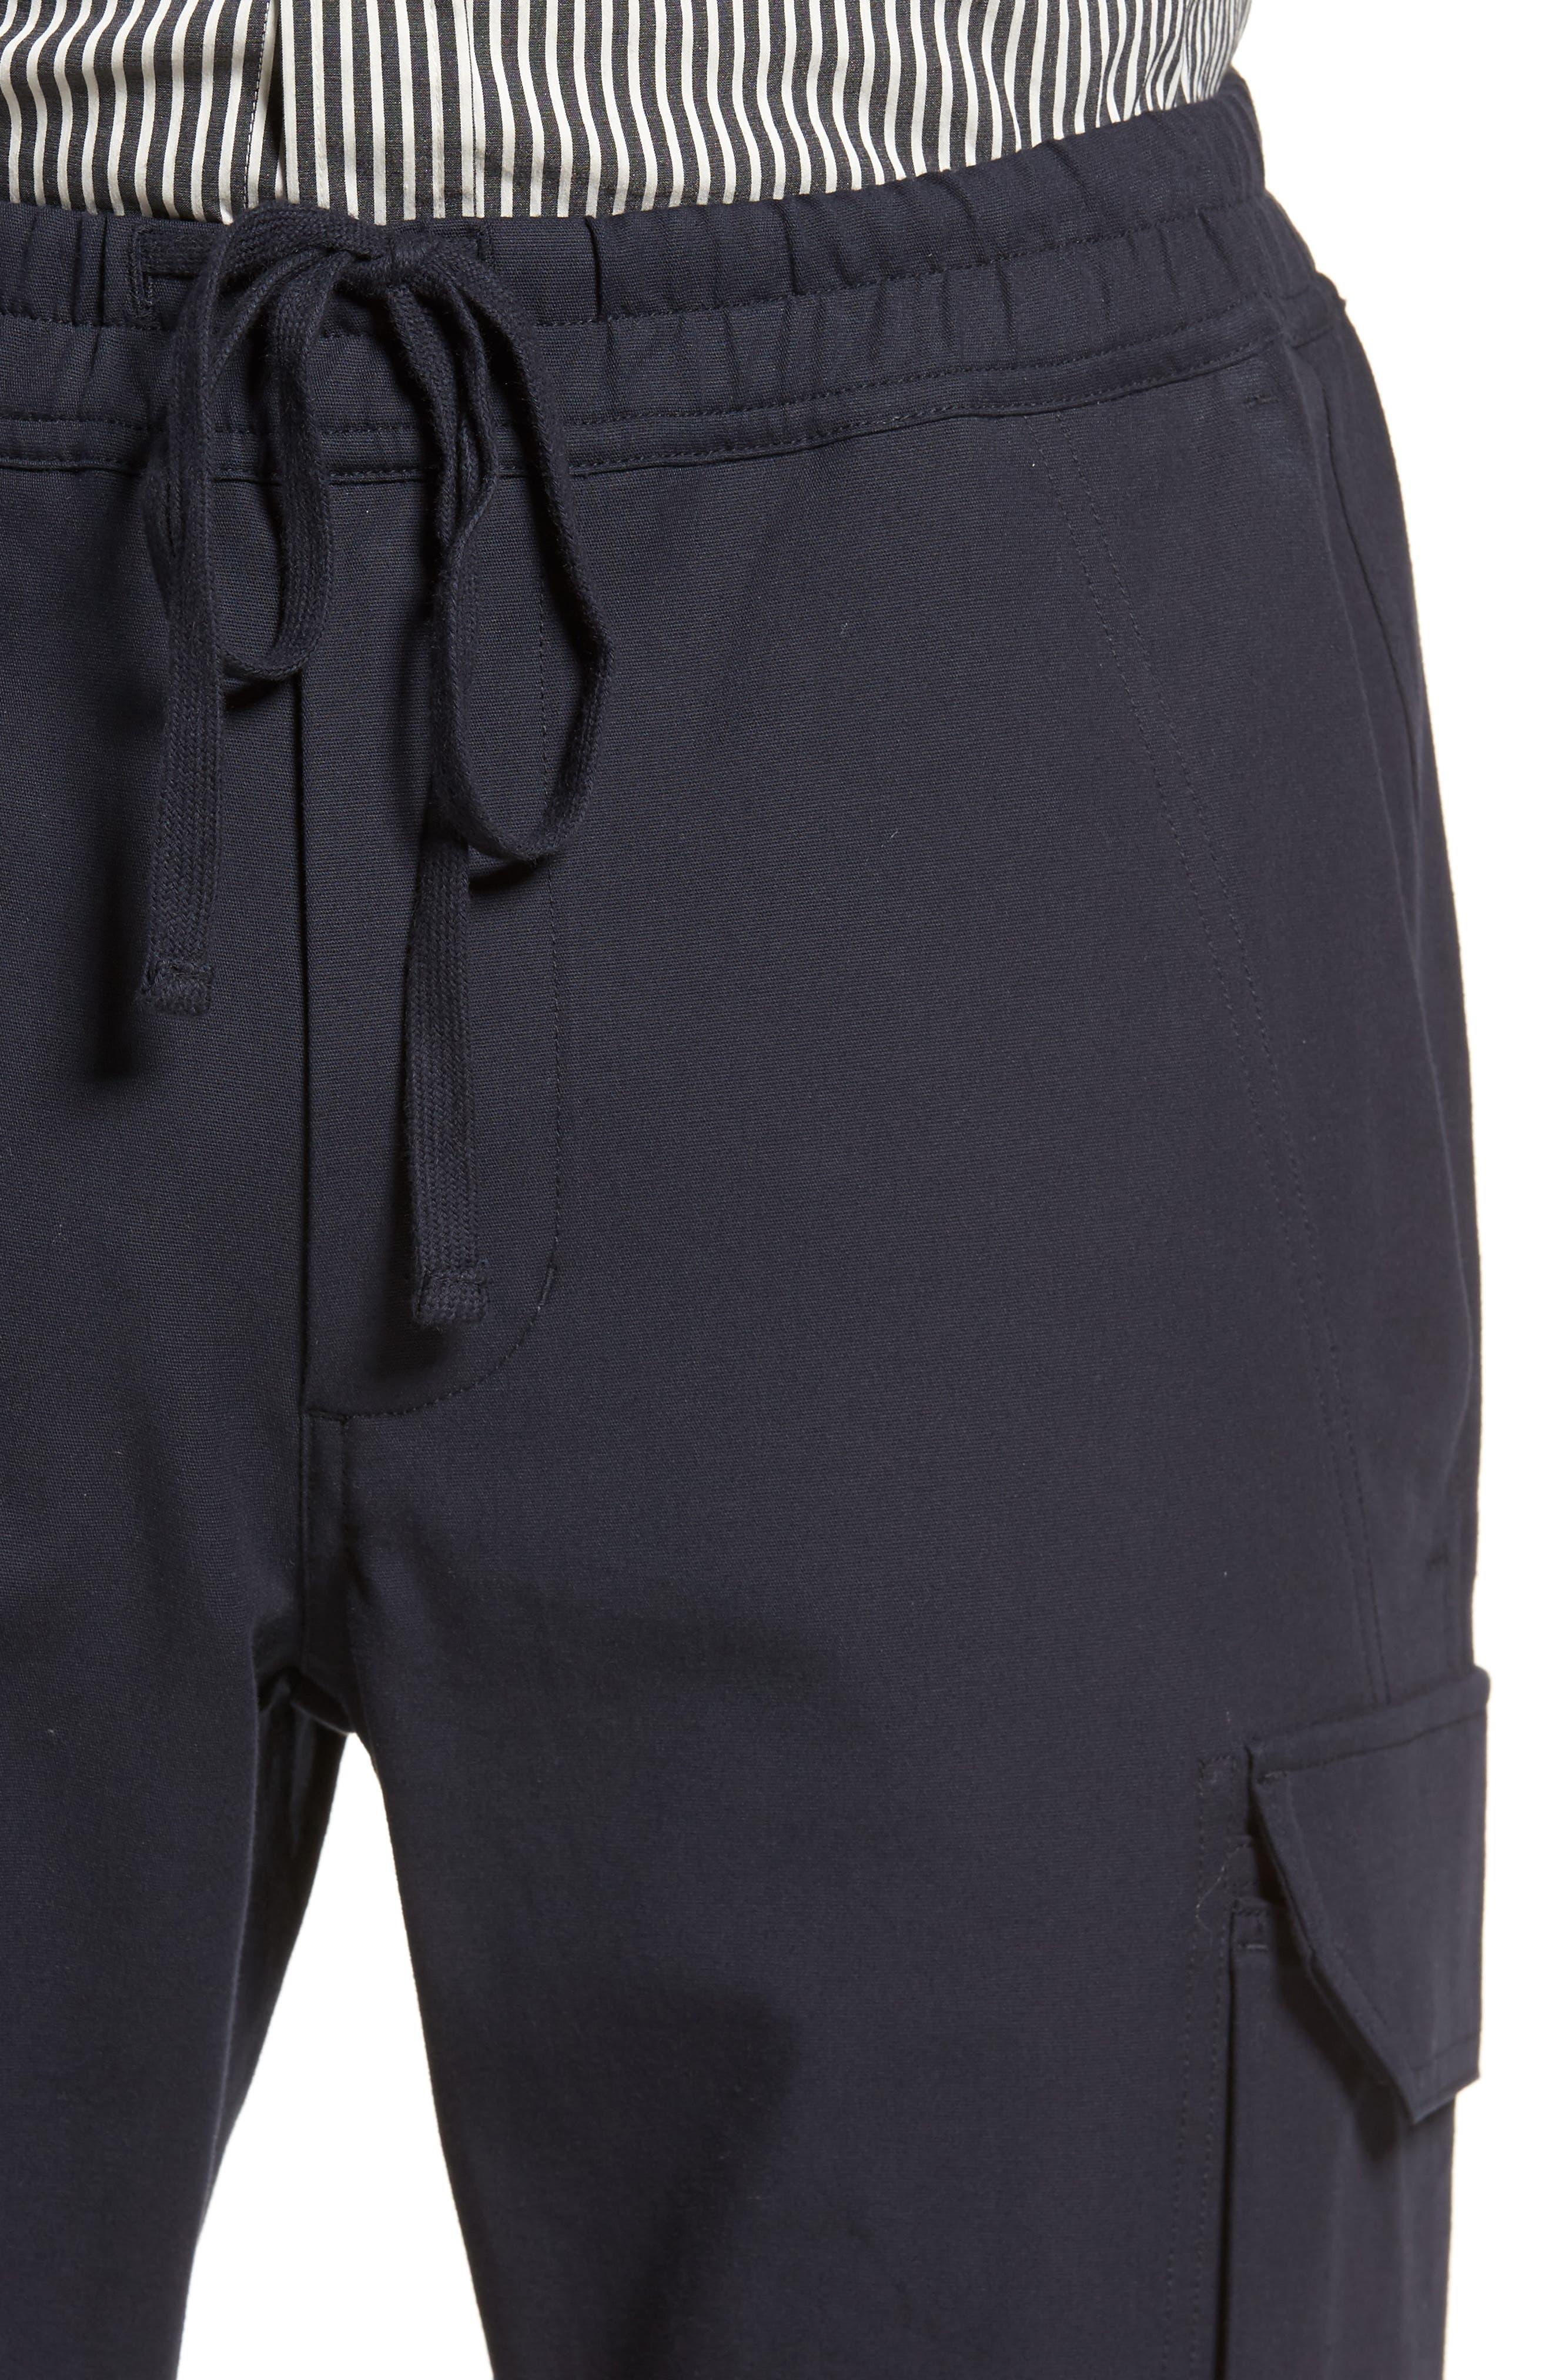 Regular Fit Drawstring Pants,                             Alternate thumbnail 4, color,